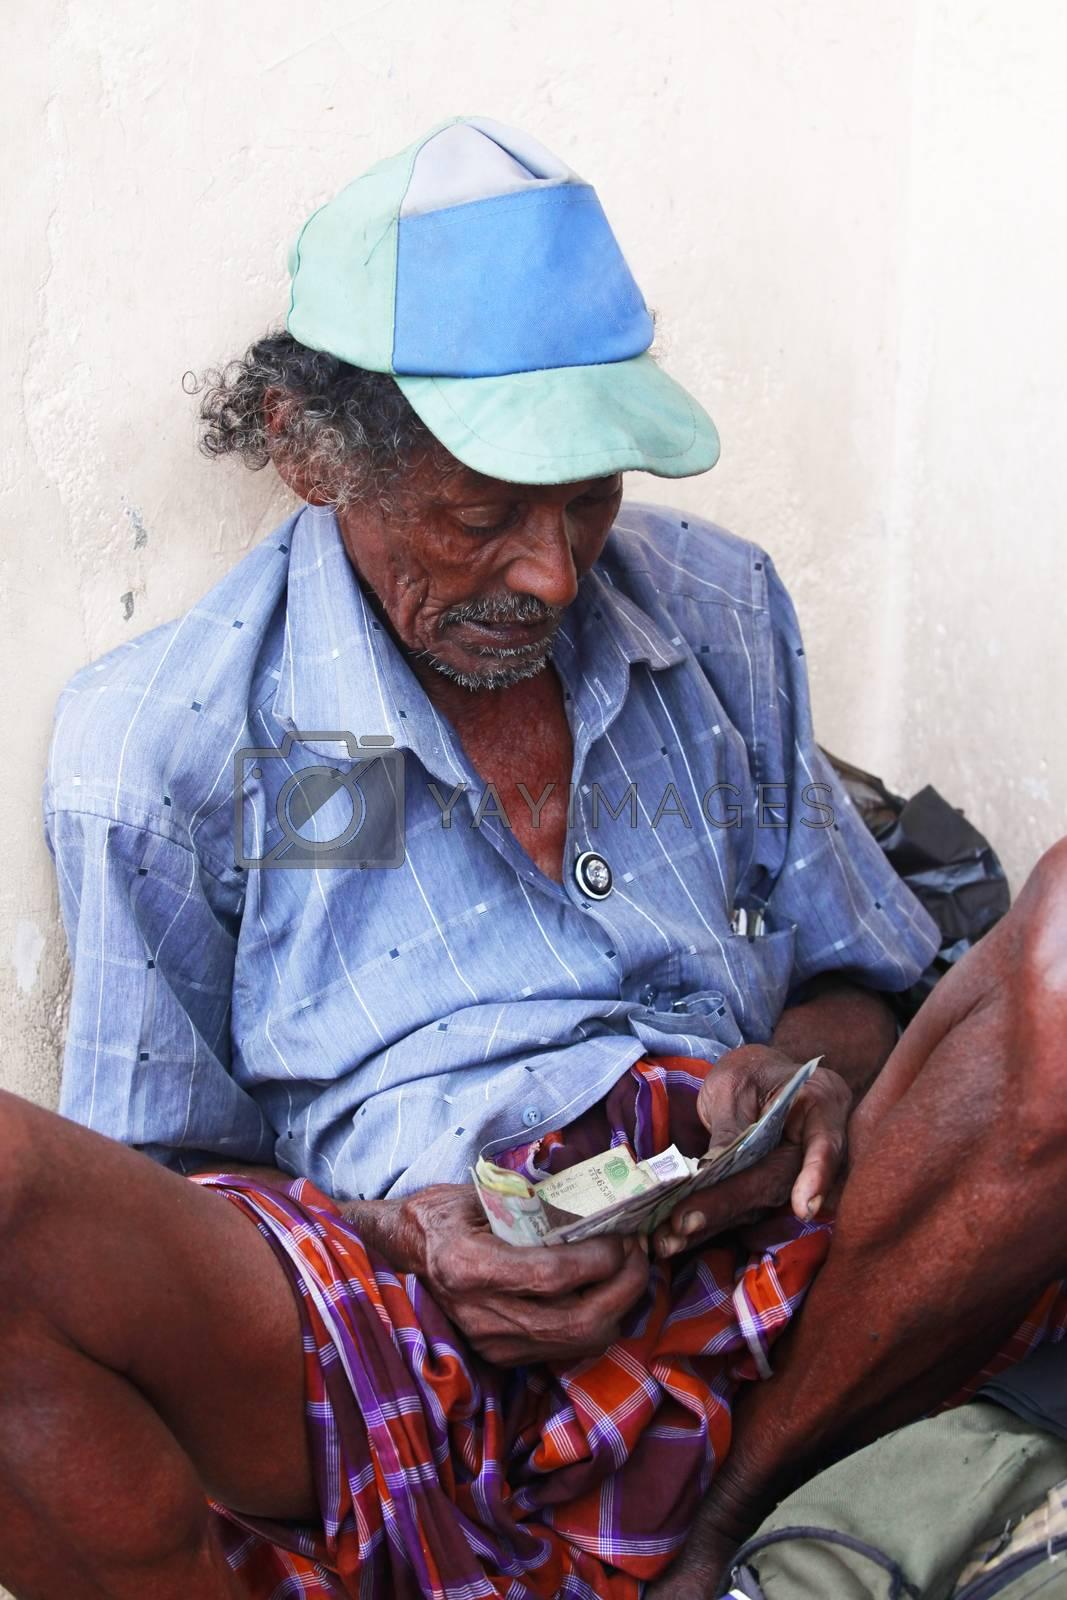 Colombo, Sri Lanka - April 9, 2011: Drunk old the beggar in the street on Sri Lanka